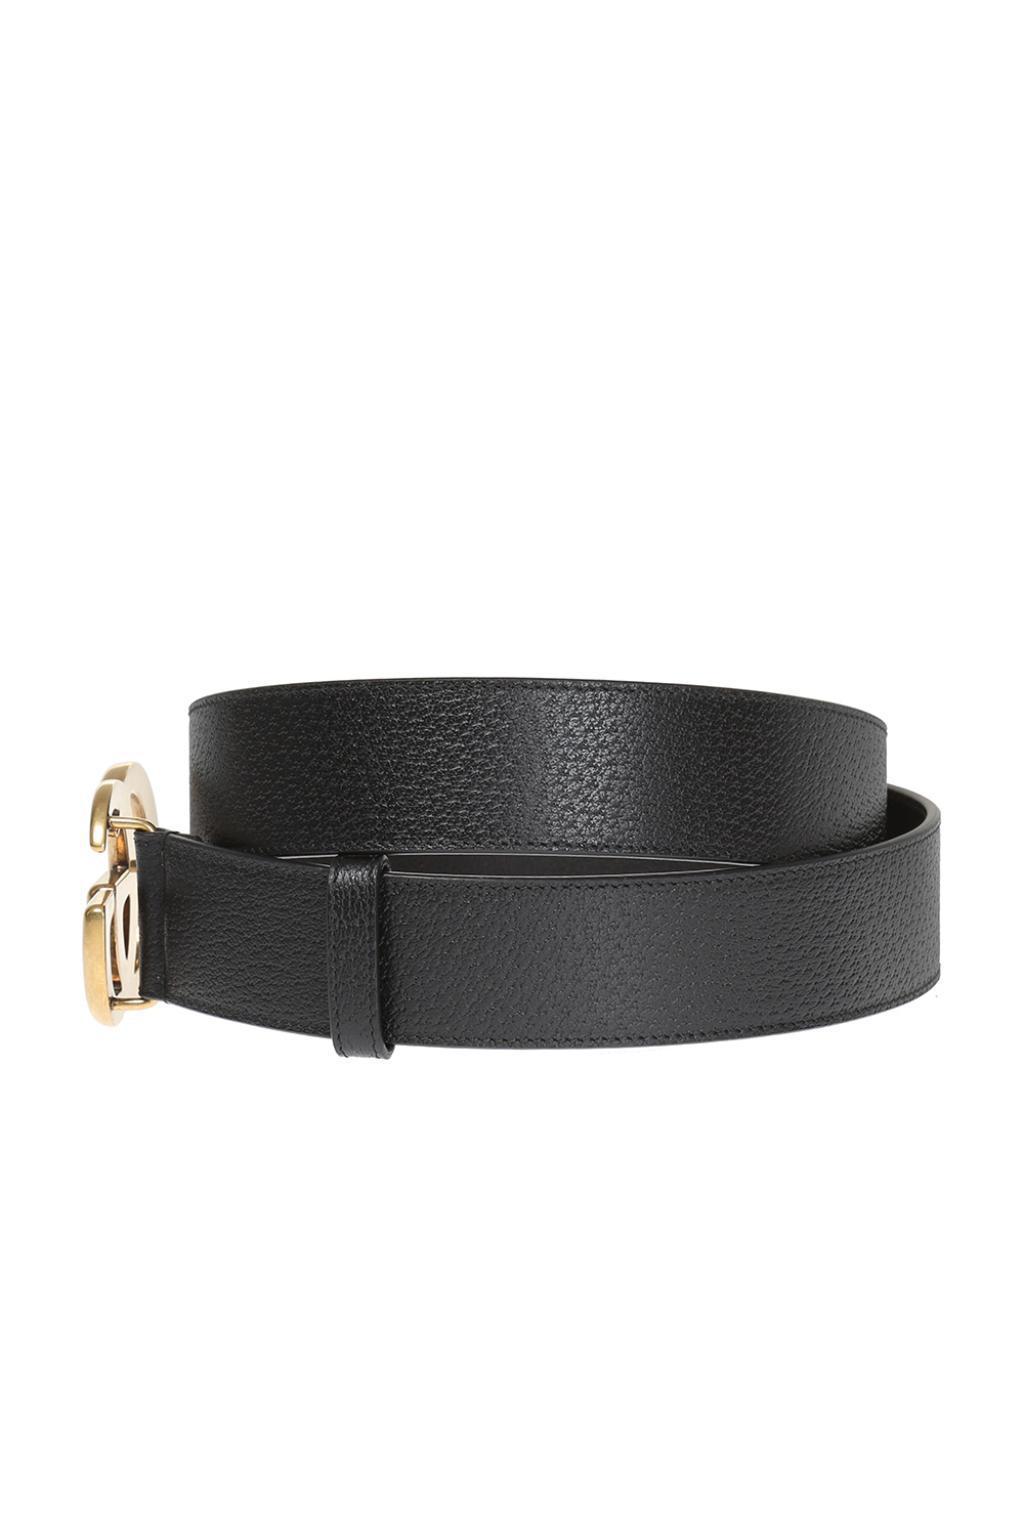 d442eee5e7e Gucci - Black Leather Belt for Men - Lyst. View fullscreen